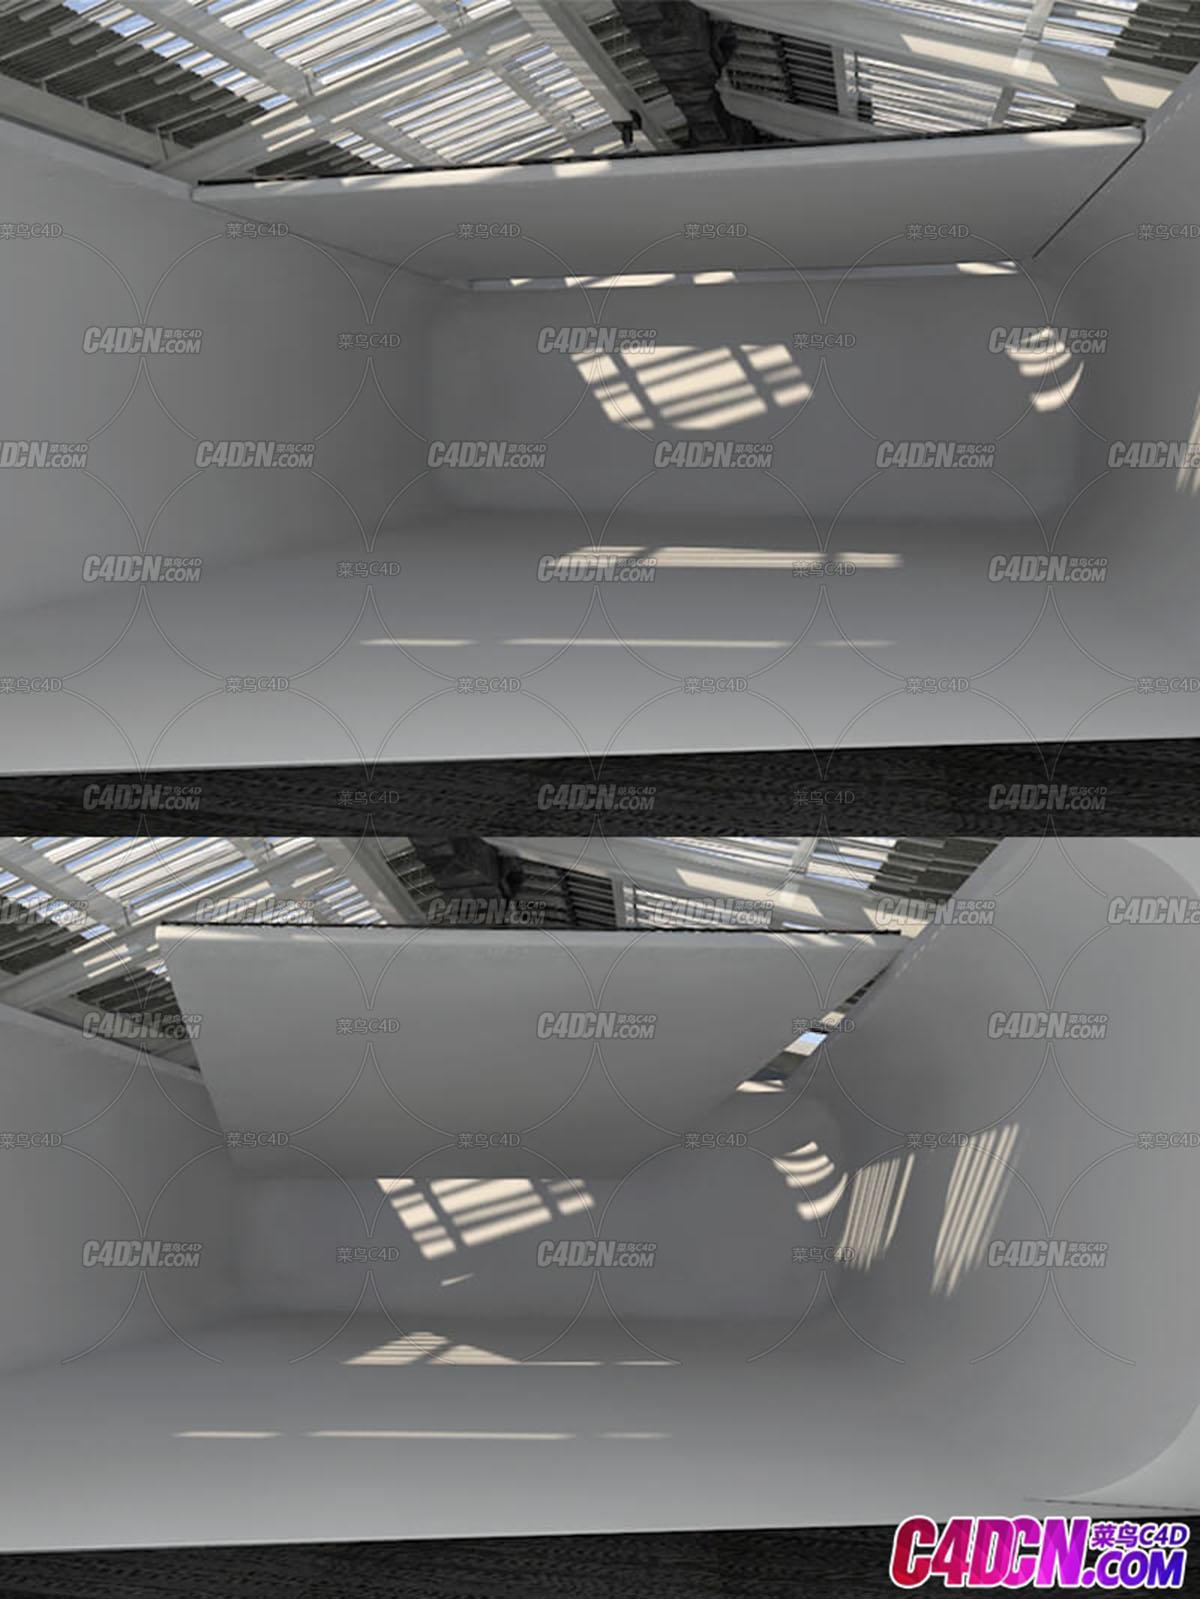 C4D模型 工厂厂房仓库房屋建筑工程模型